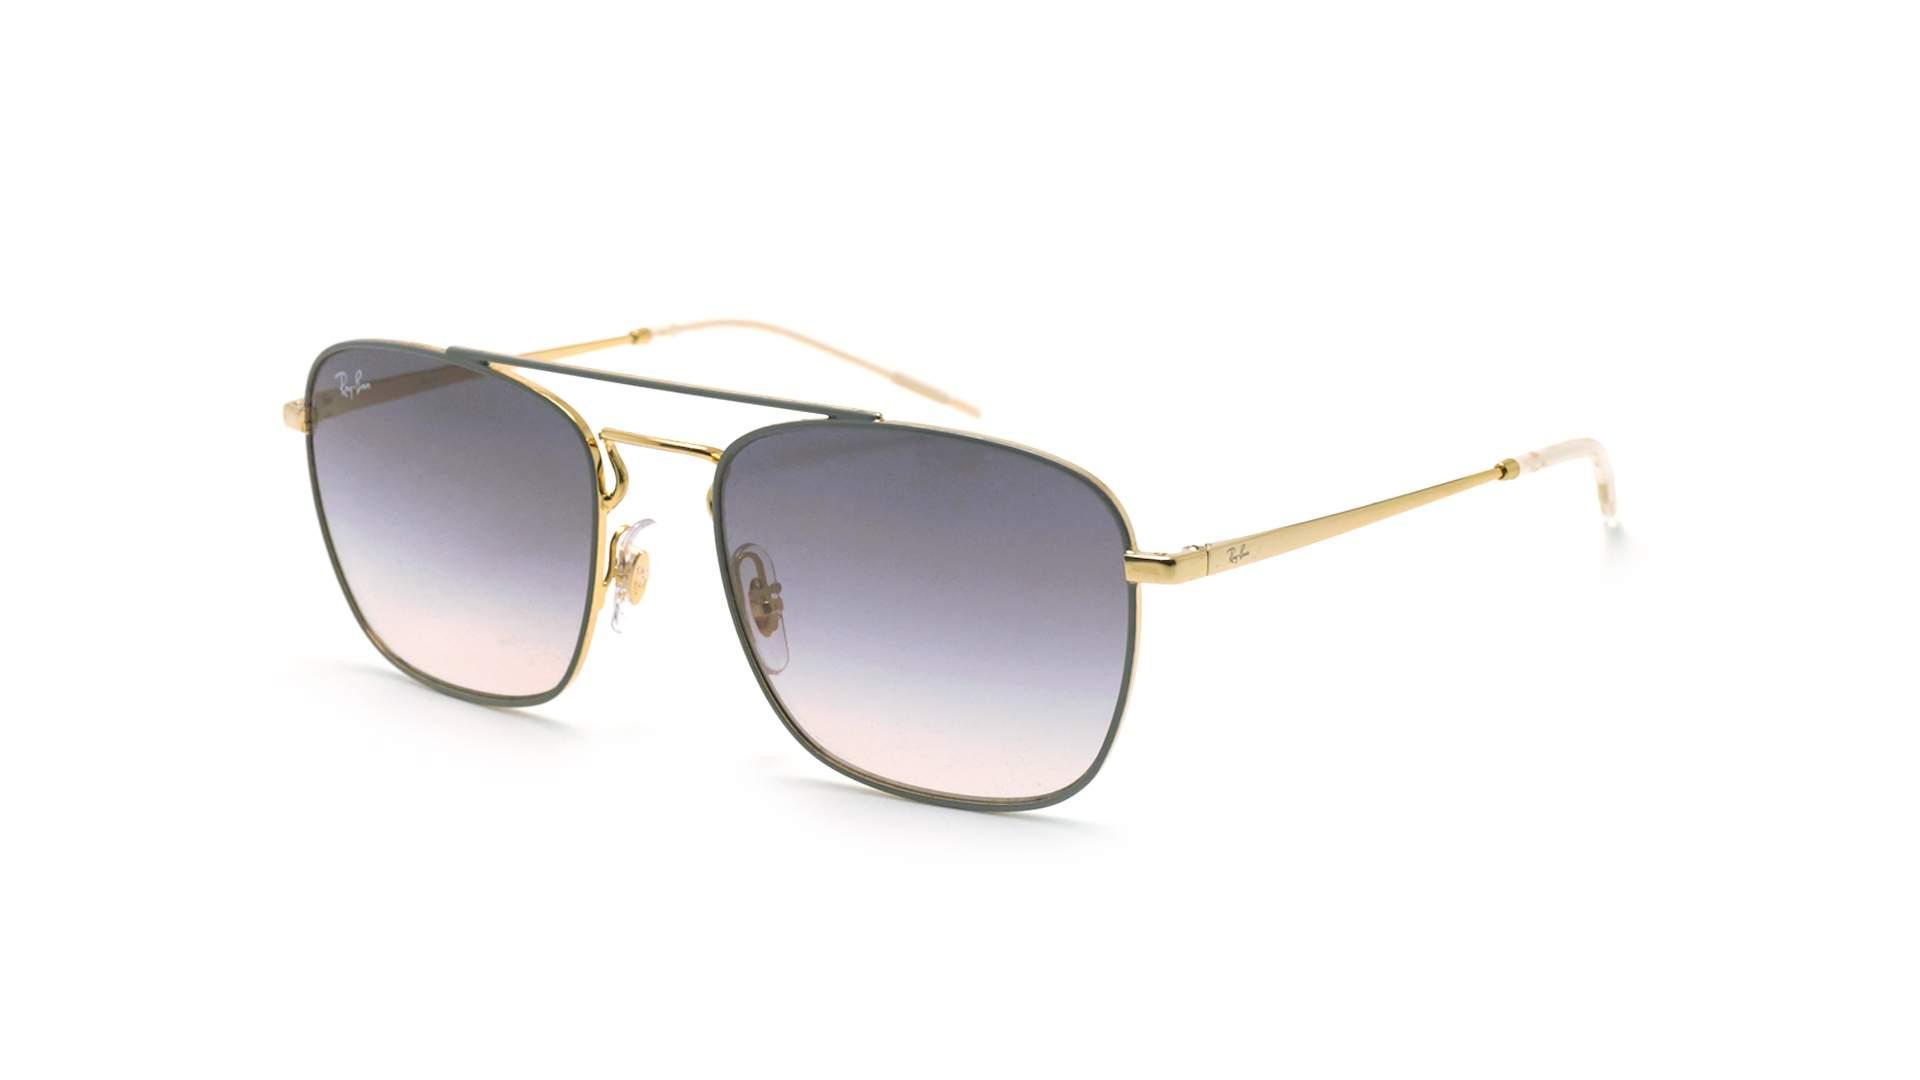 39147478974 Sunglasses Ray-Ban RB3588 9063 I9 55-19 Grey Medium Gradient